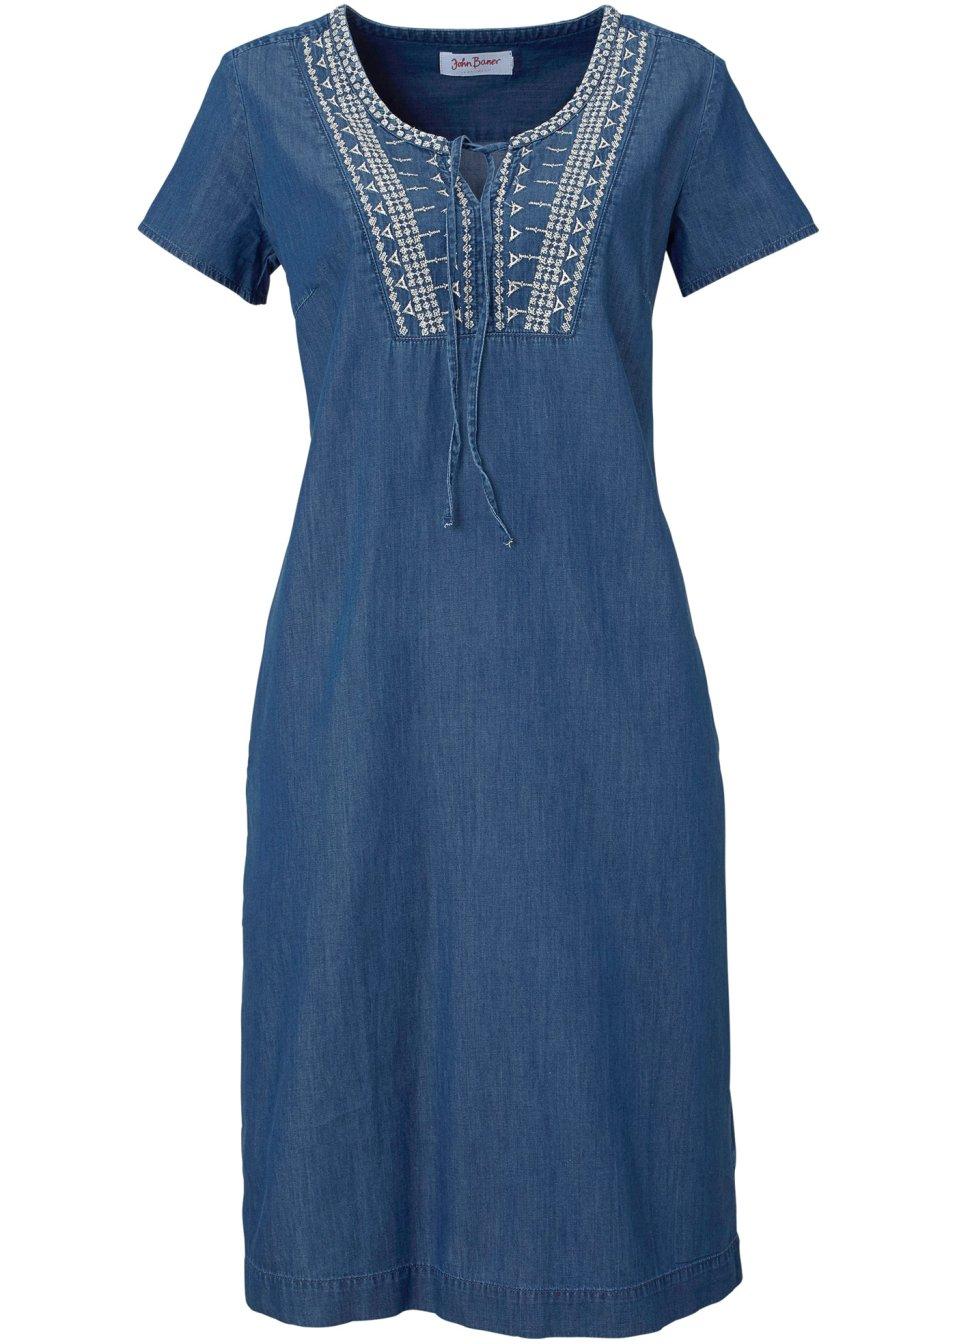 robe en jean avec broderie manches courtes bleu john. Black Bedroom Furniture Sets. Home Design Ideas